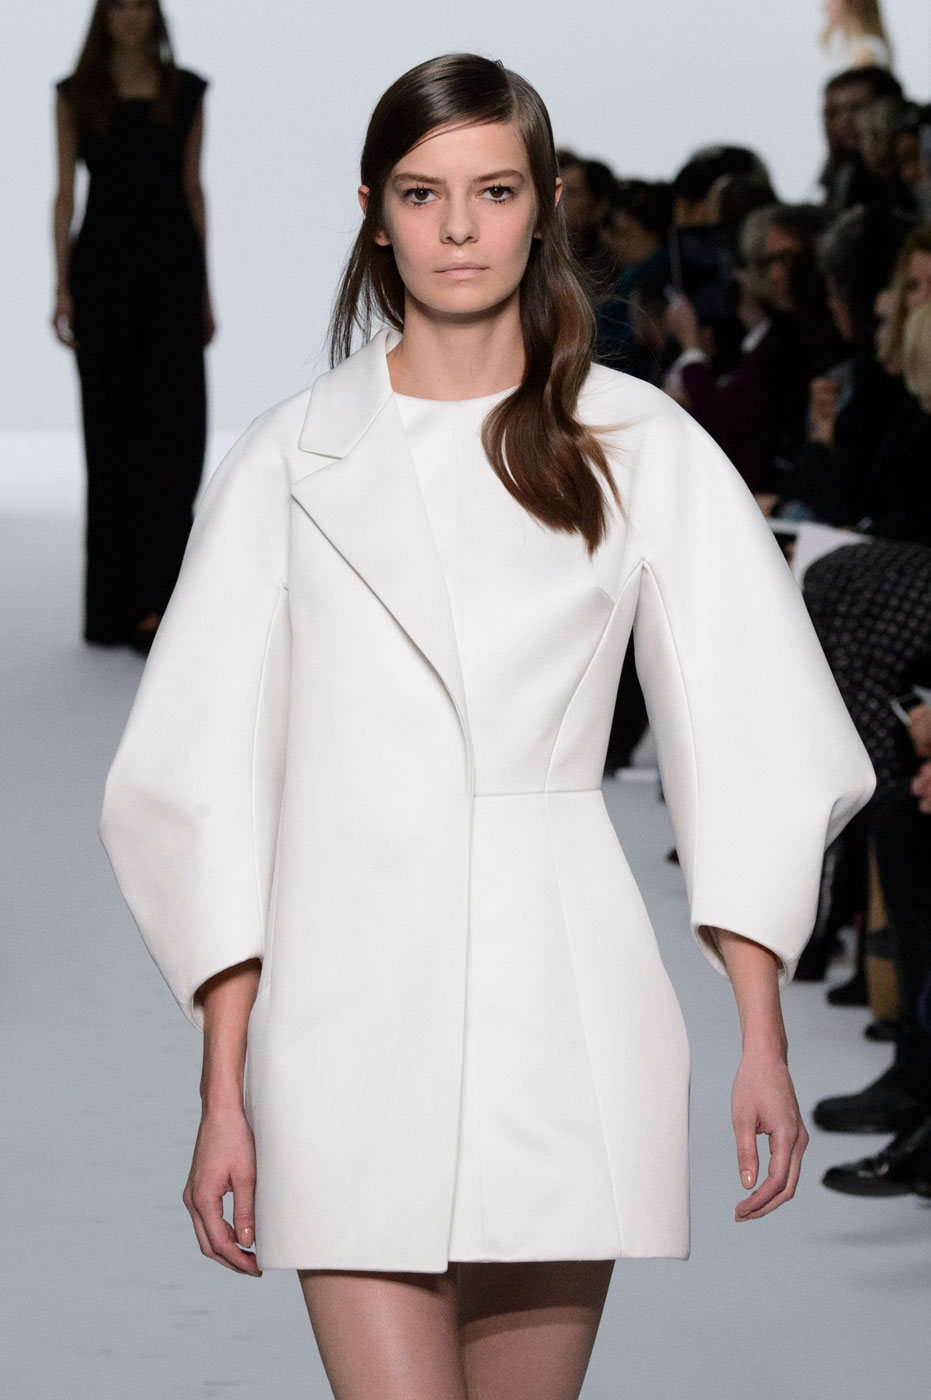 Kayek-fashion-runway-show-haute-couture-paris-spring-summer-2015-the-impression-12